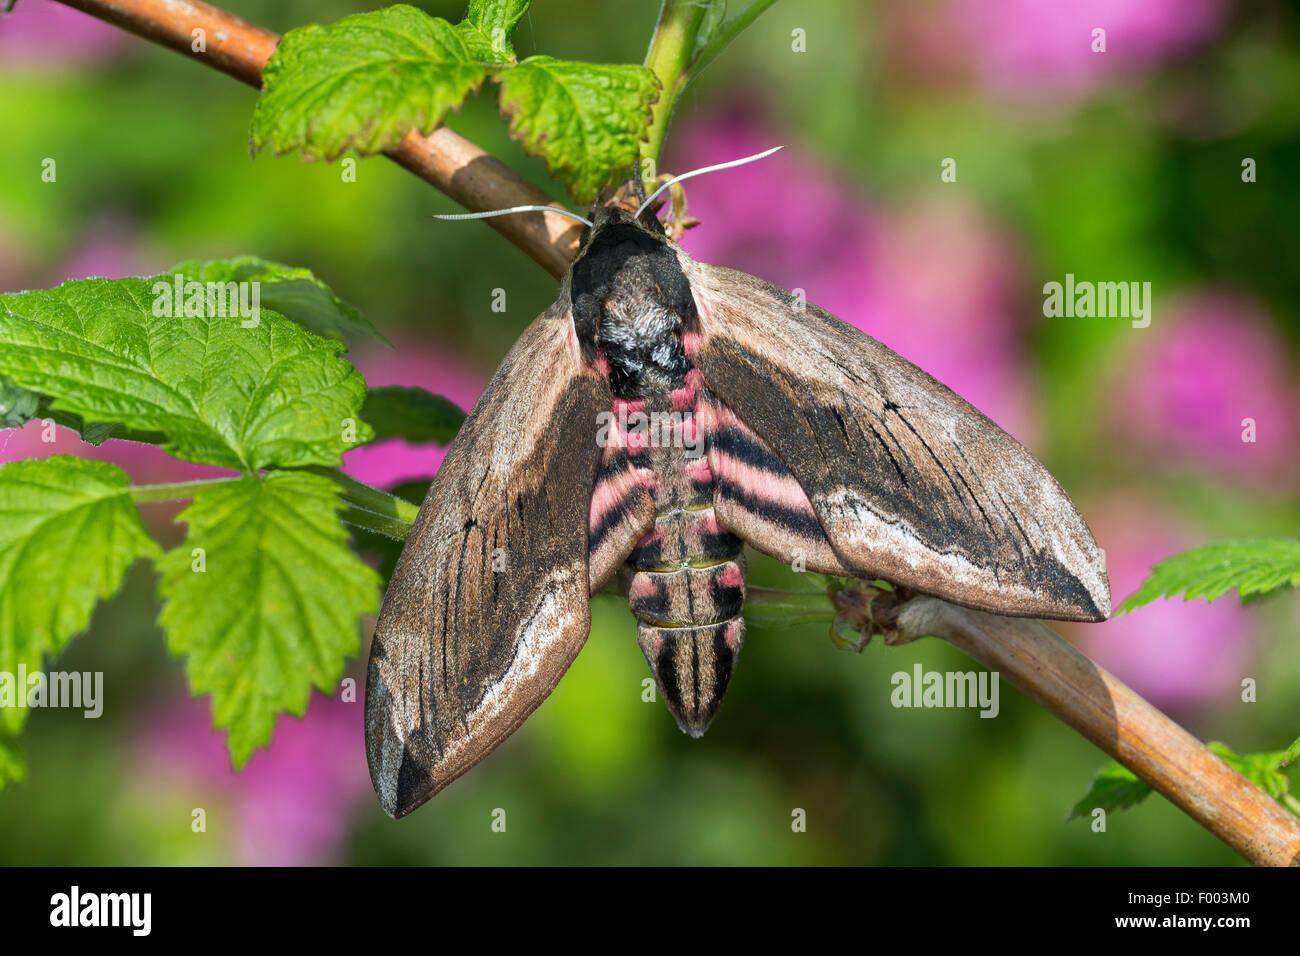 privet hawkmoth (Sphinx ligustri), at a twig, Germany - Stock Image